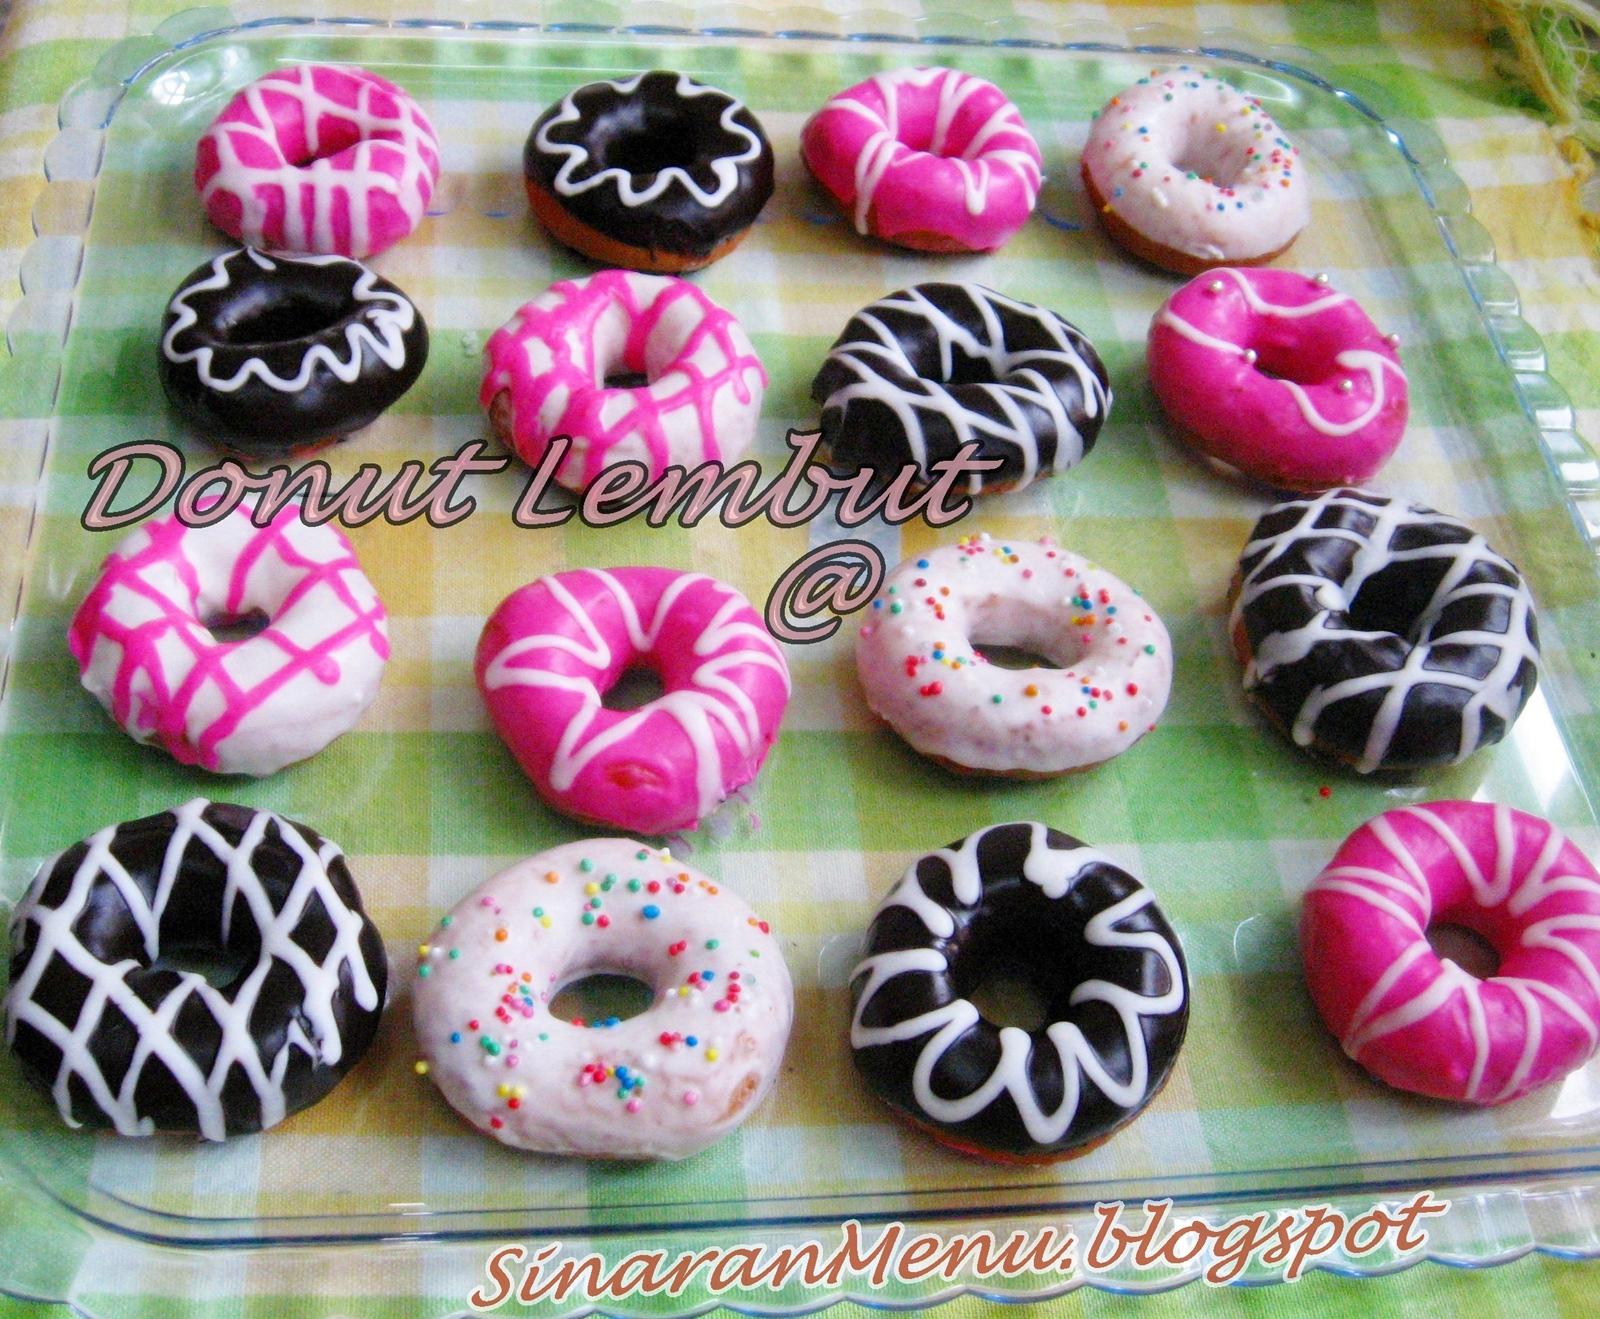 SinaranMenu: Donut lembut